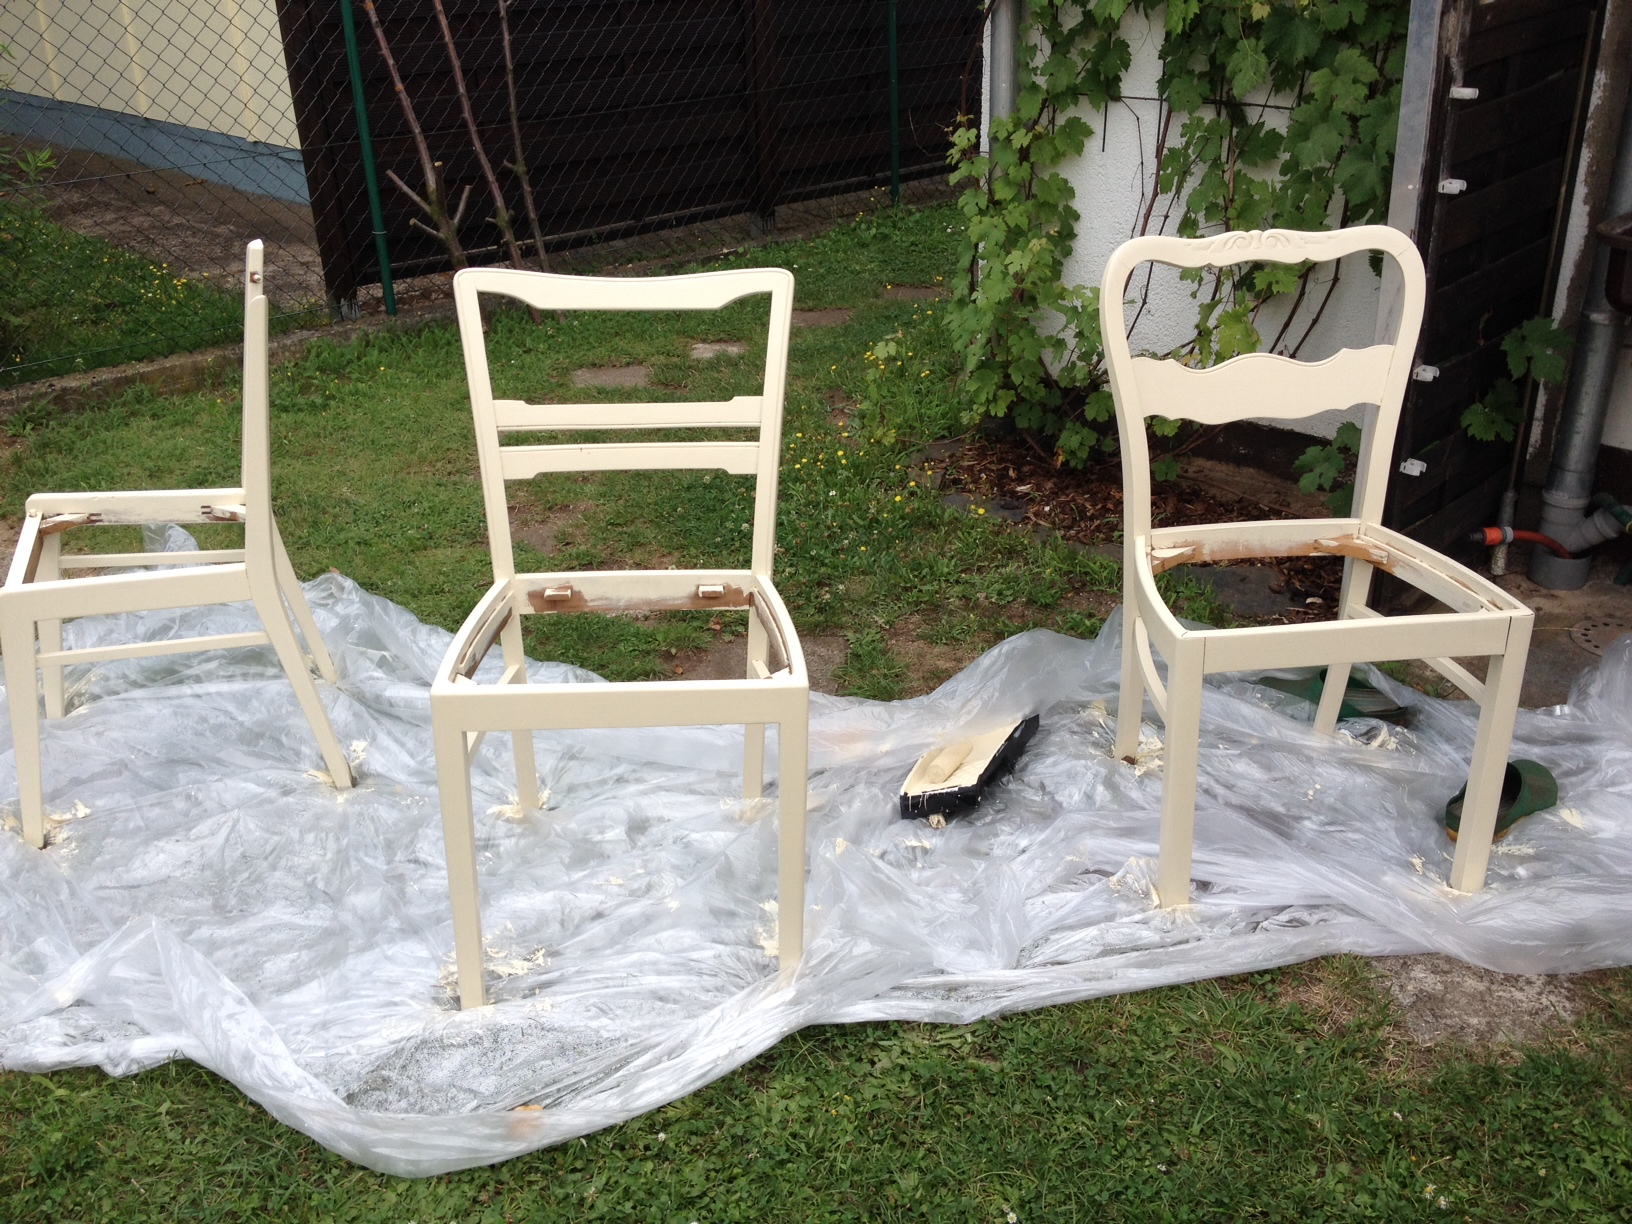 restaurieren nieselpriem. Black Bedroom Furniture Sets. Home Design Ideas